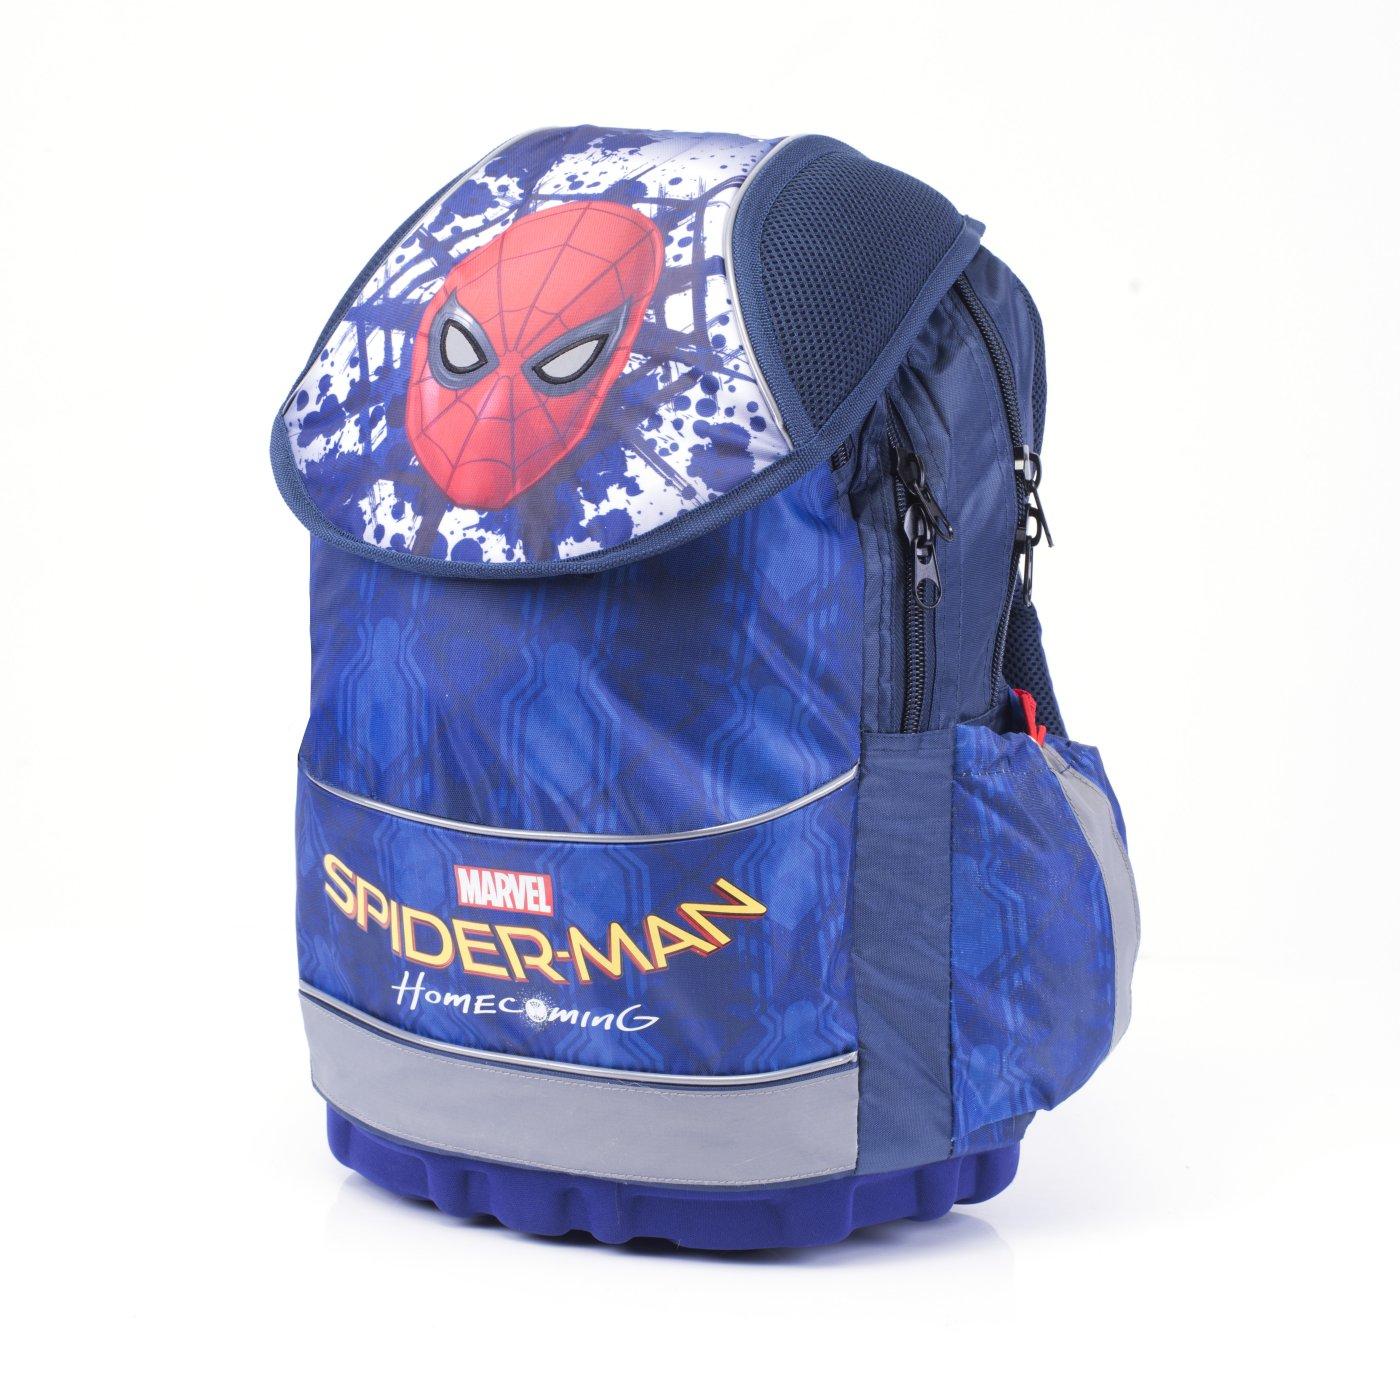 ... Školní batoh PLUS Spiderman The Walt Disney Company Licensing (Spiderman).  Výprodej. Image 63319248c6